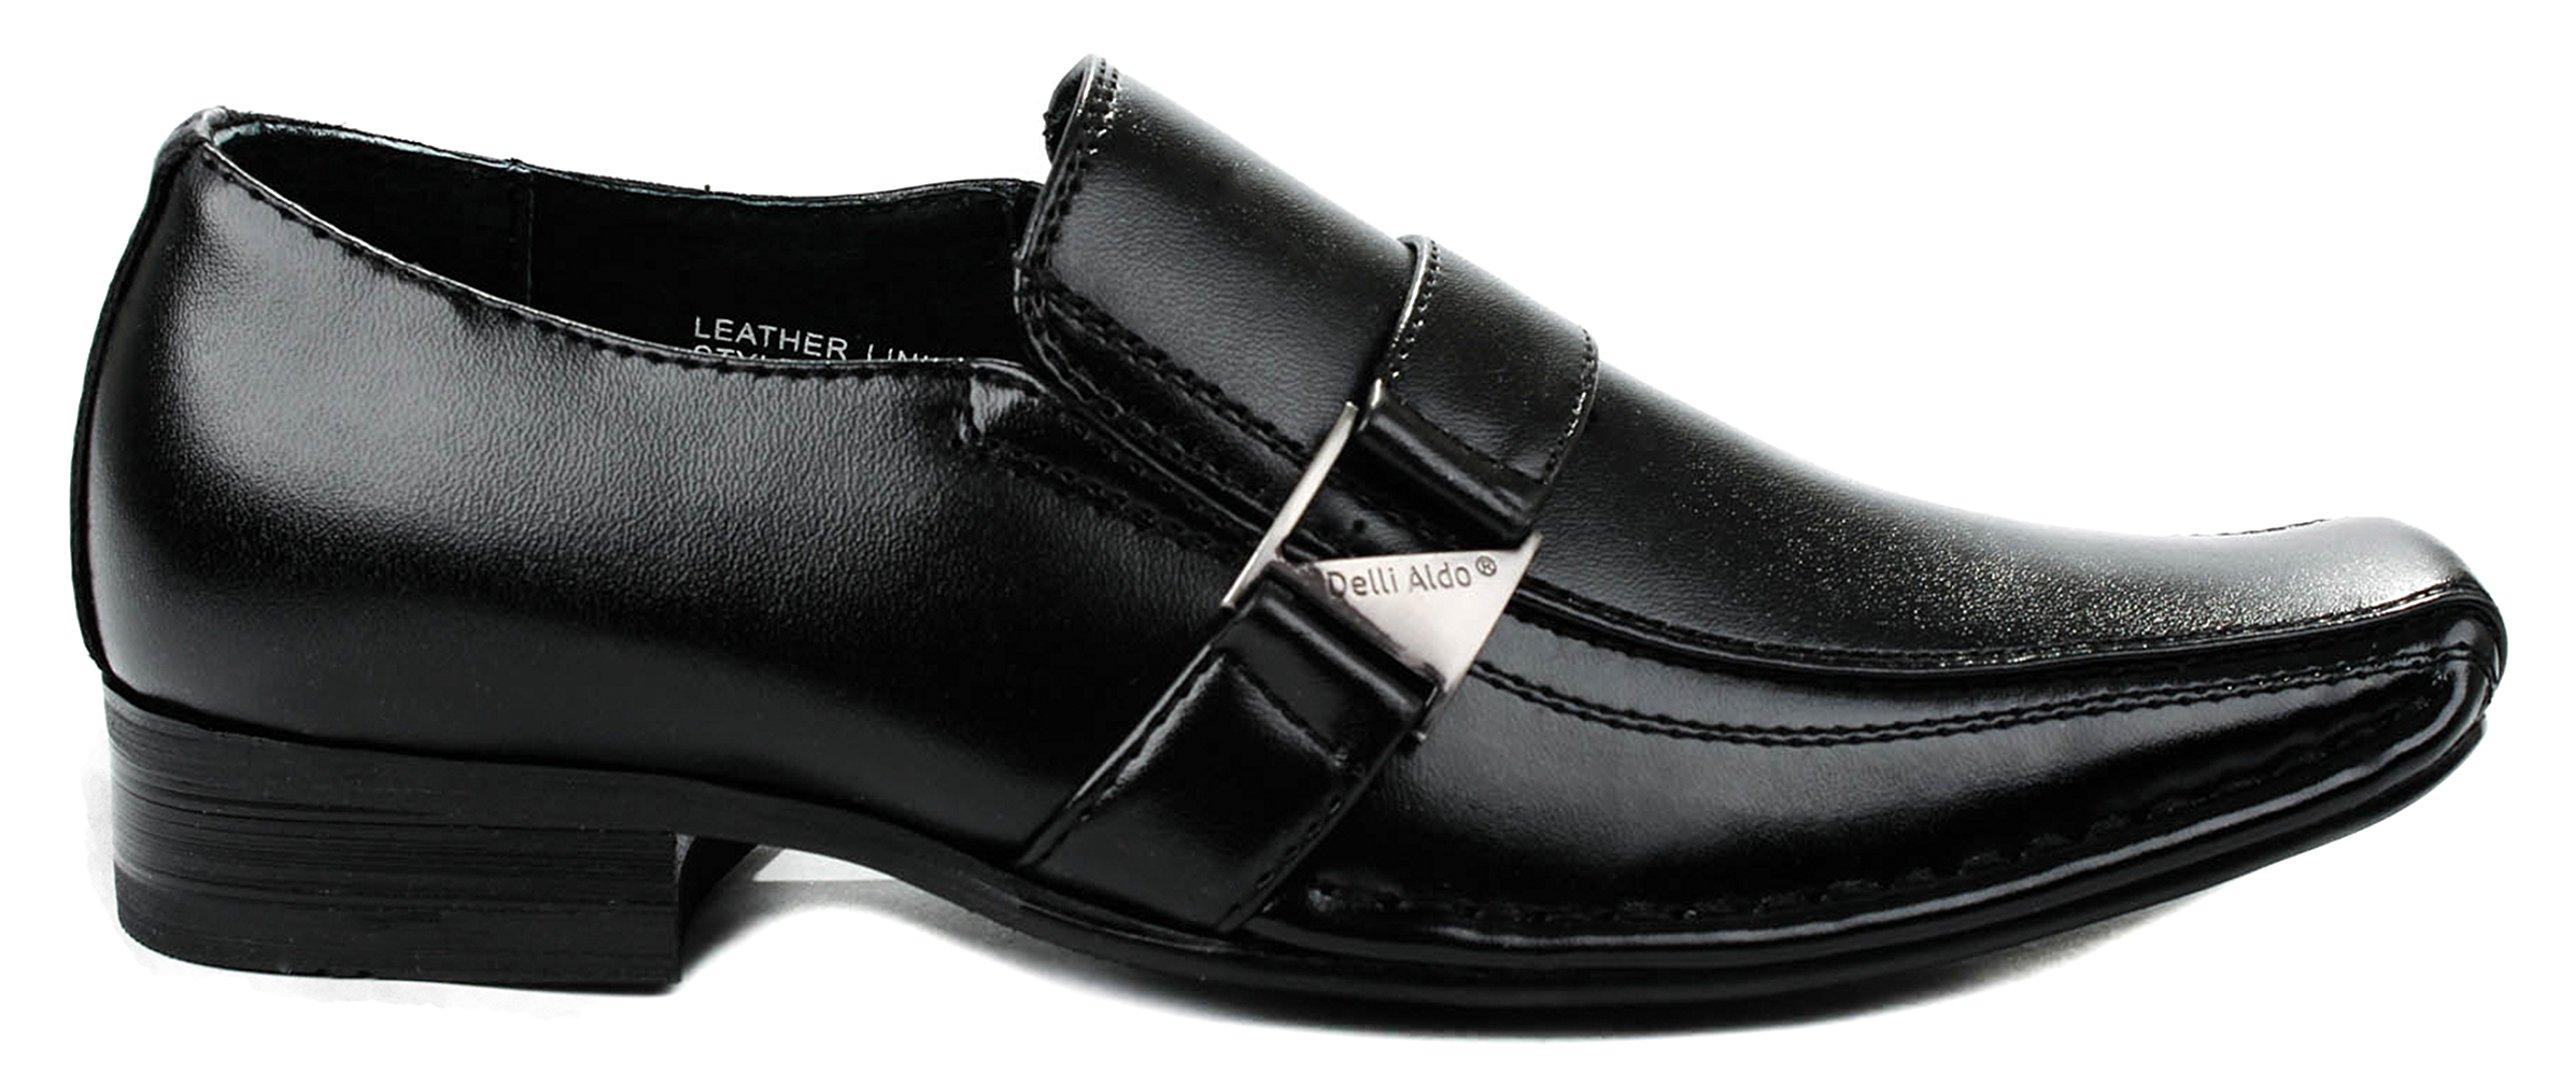 Delli Aldo Boys B99003 Black Formal Squared Toe Buckle Strap Lofer Shoes-3